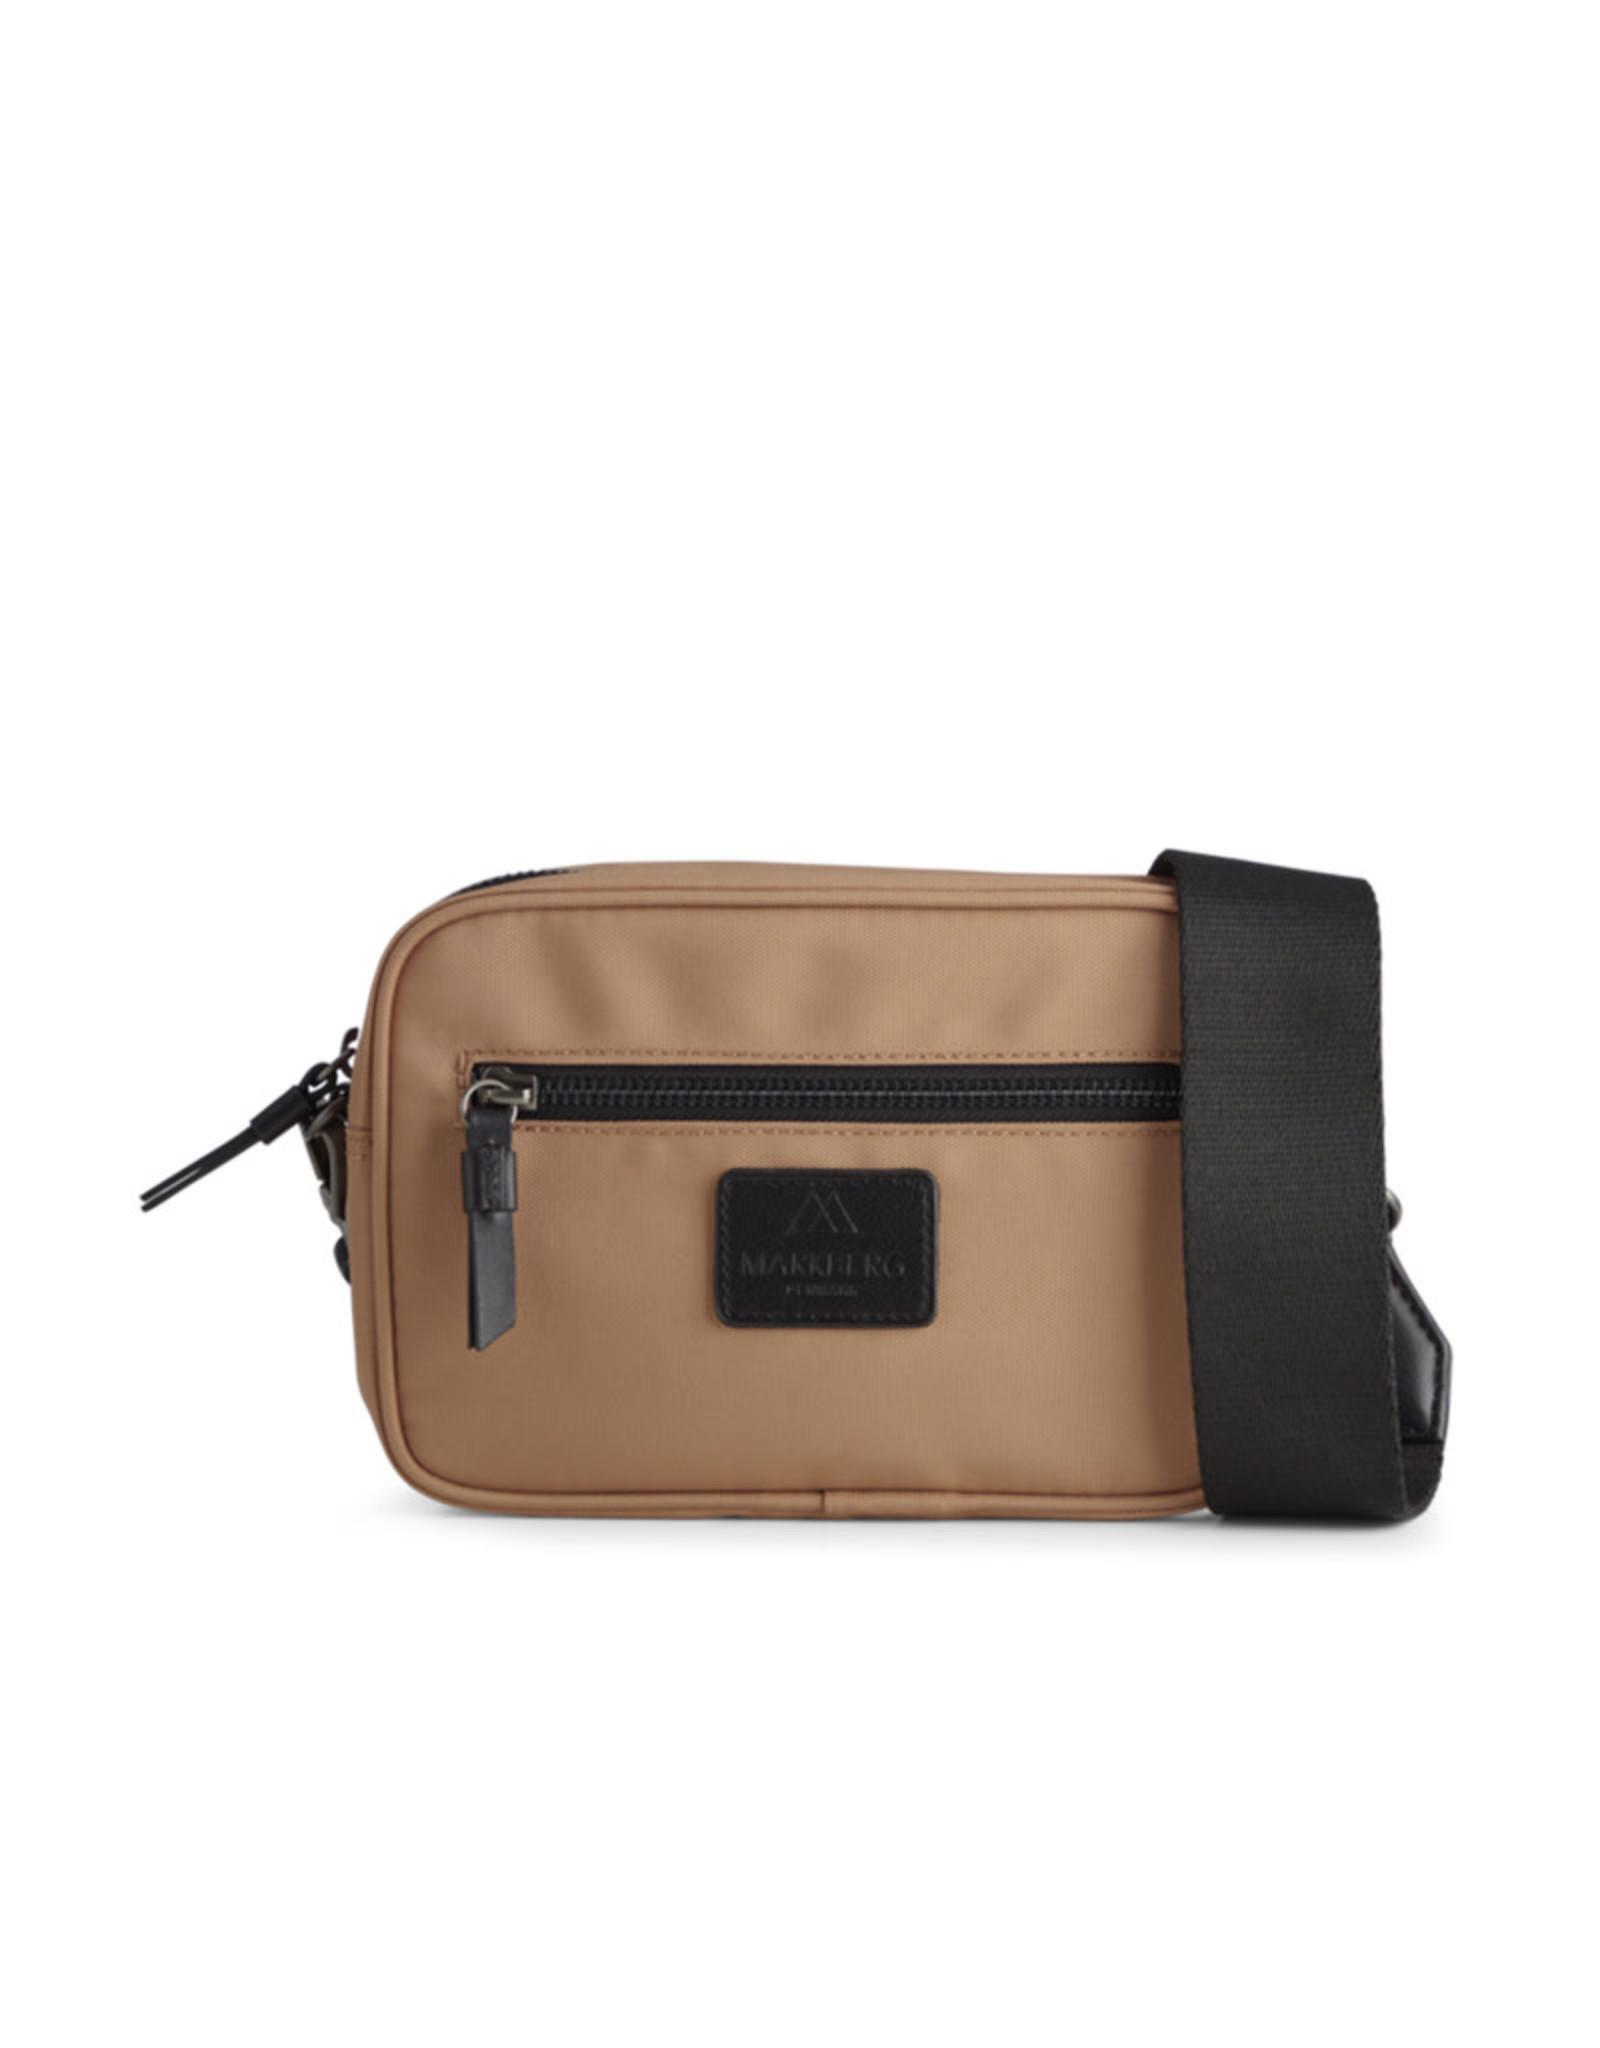 Markberg Elea Crossbody bag, Recycled